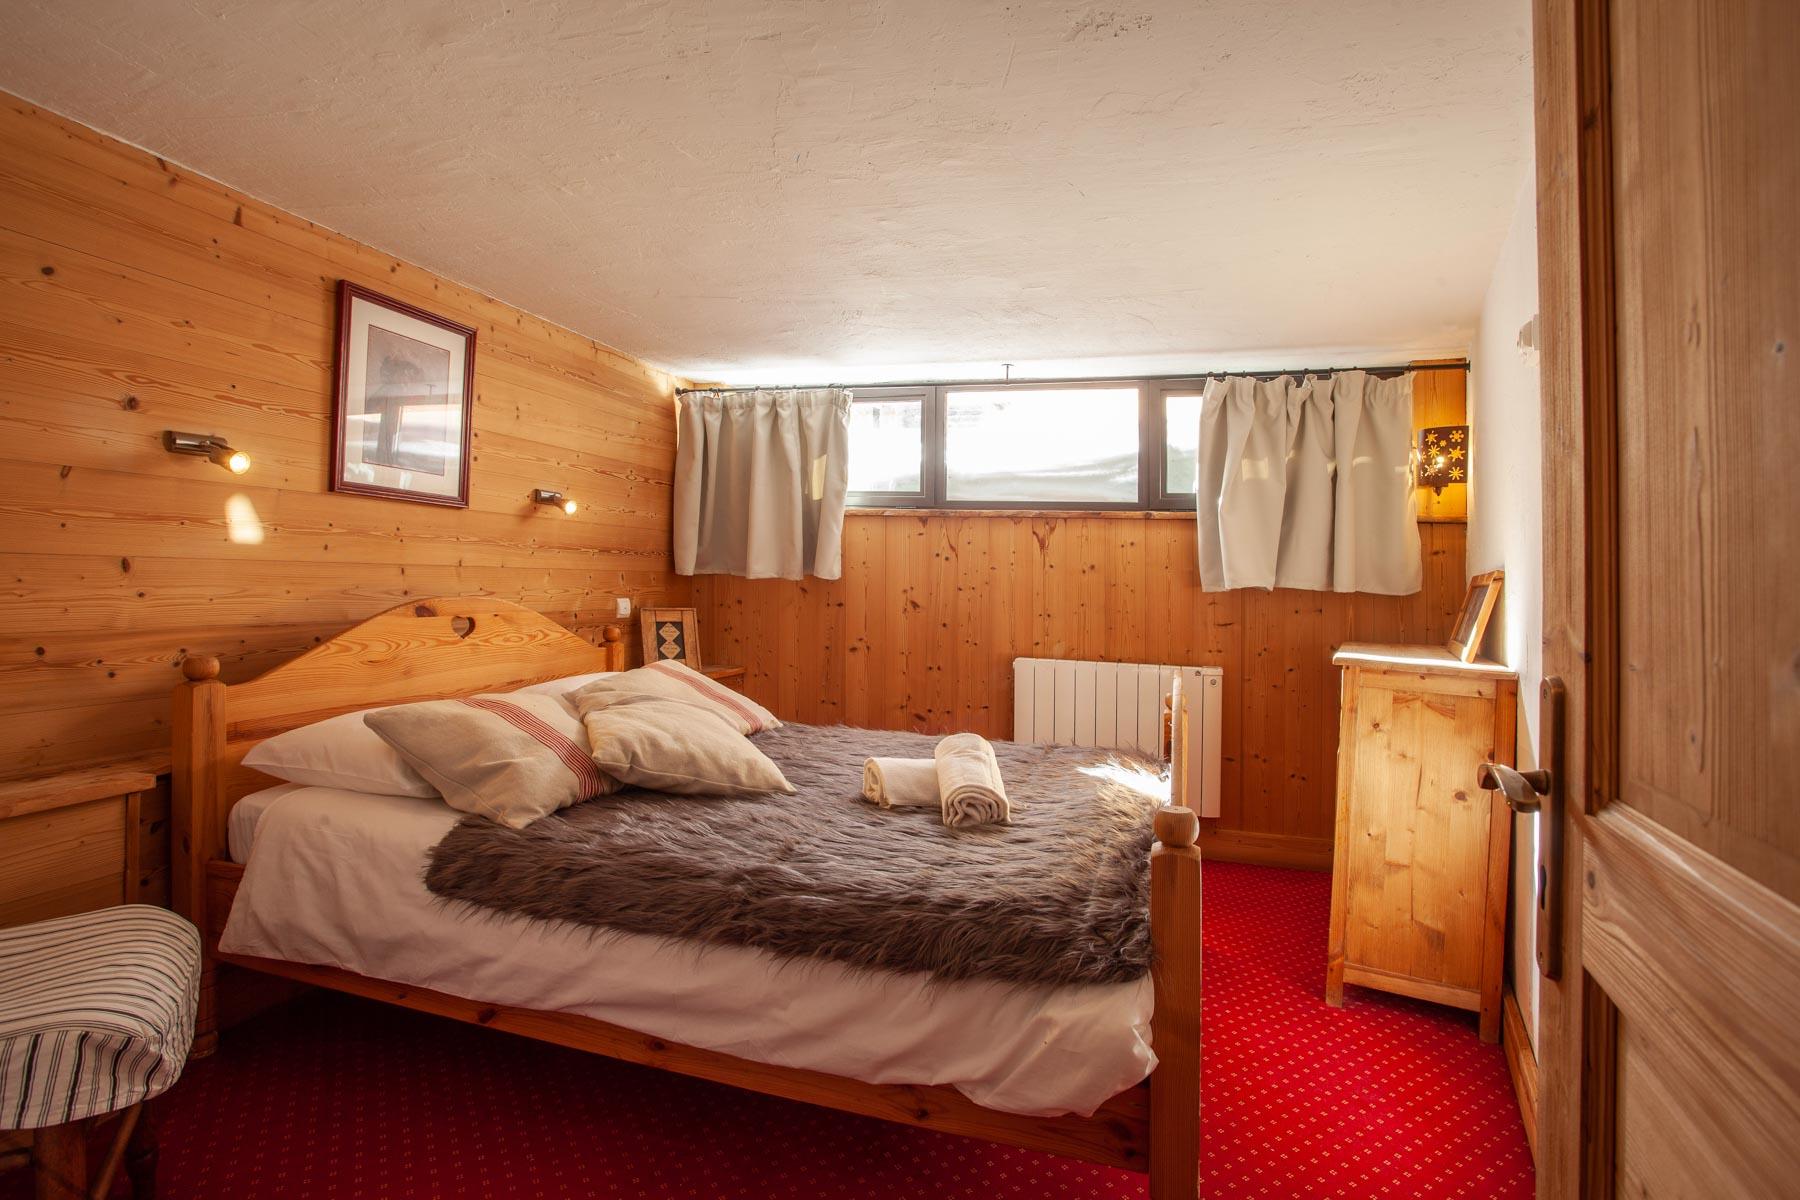 Avoriaz Appt 1954 Family Bedroom